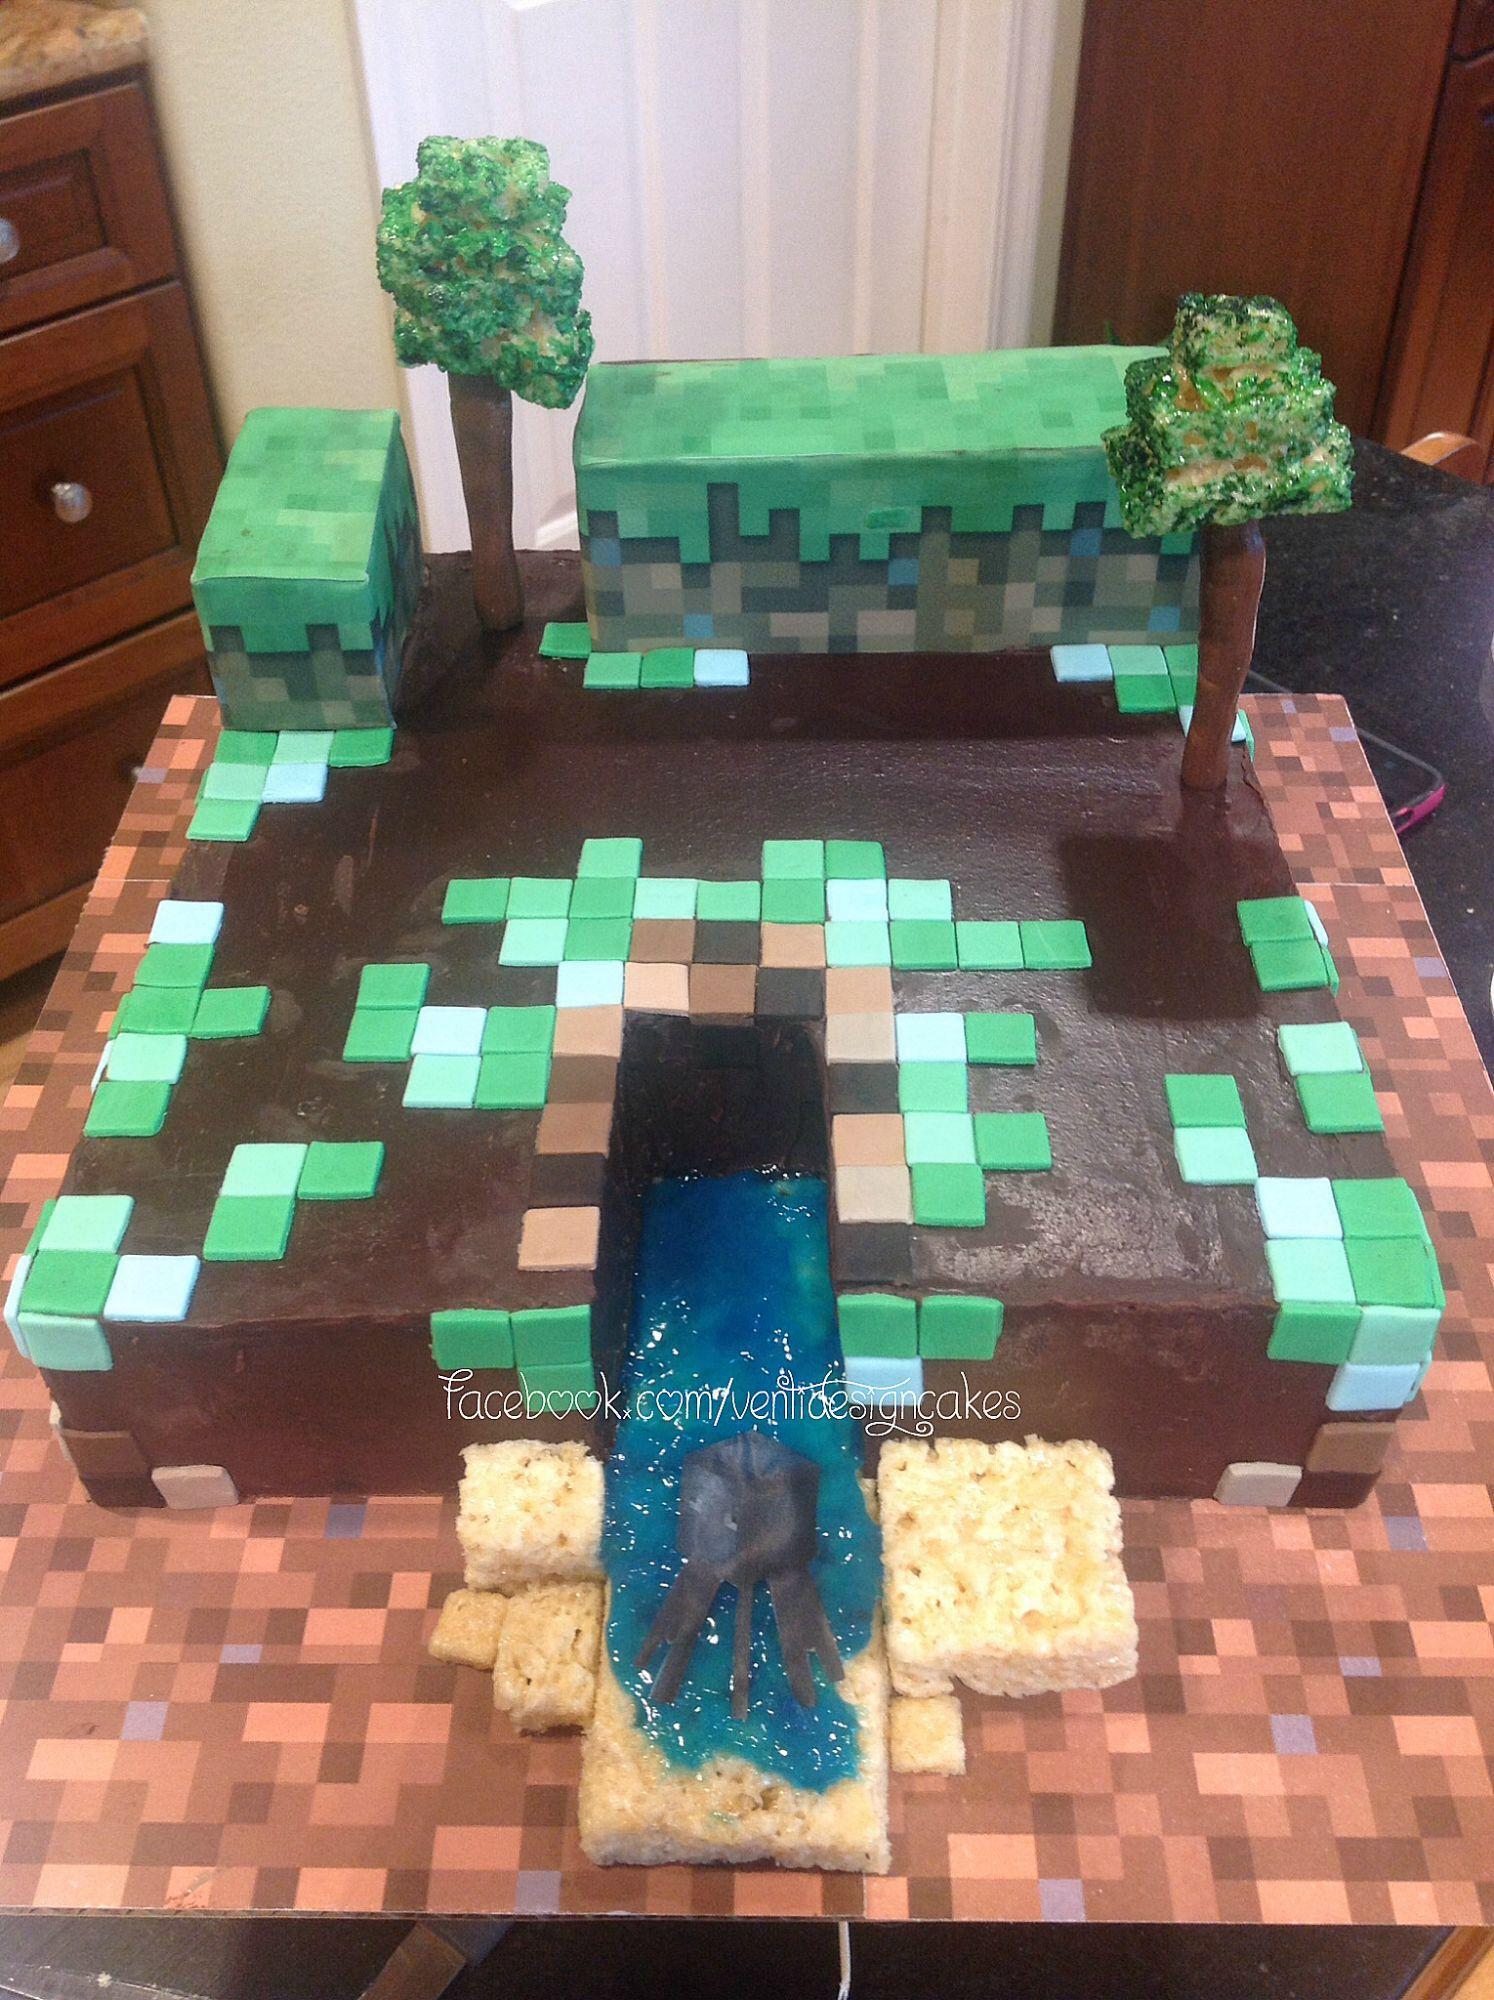 Minecraft cakes ideas for kids 14668 minecraft birthday ca for Minecraft crafts for kids